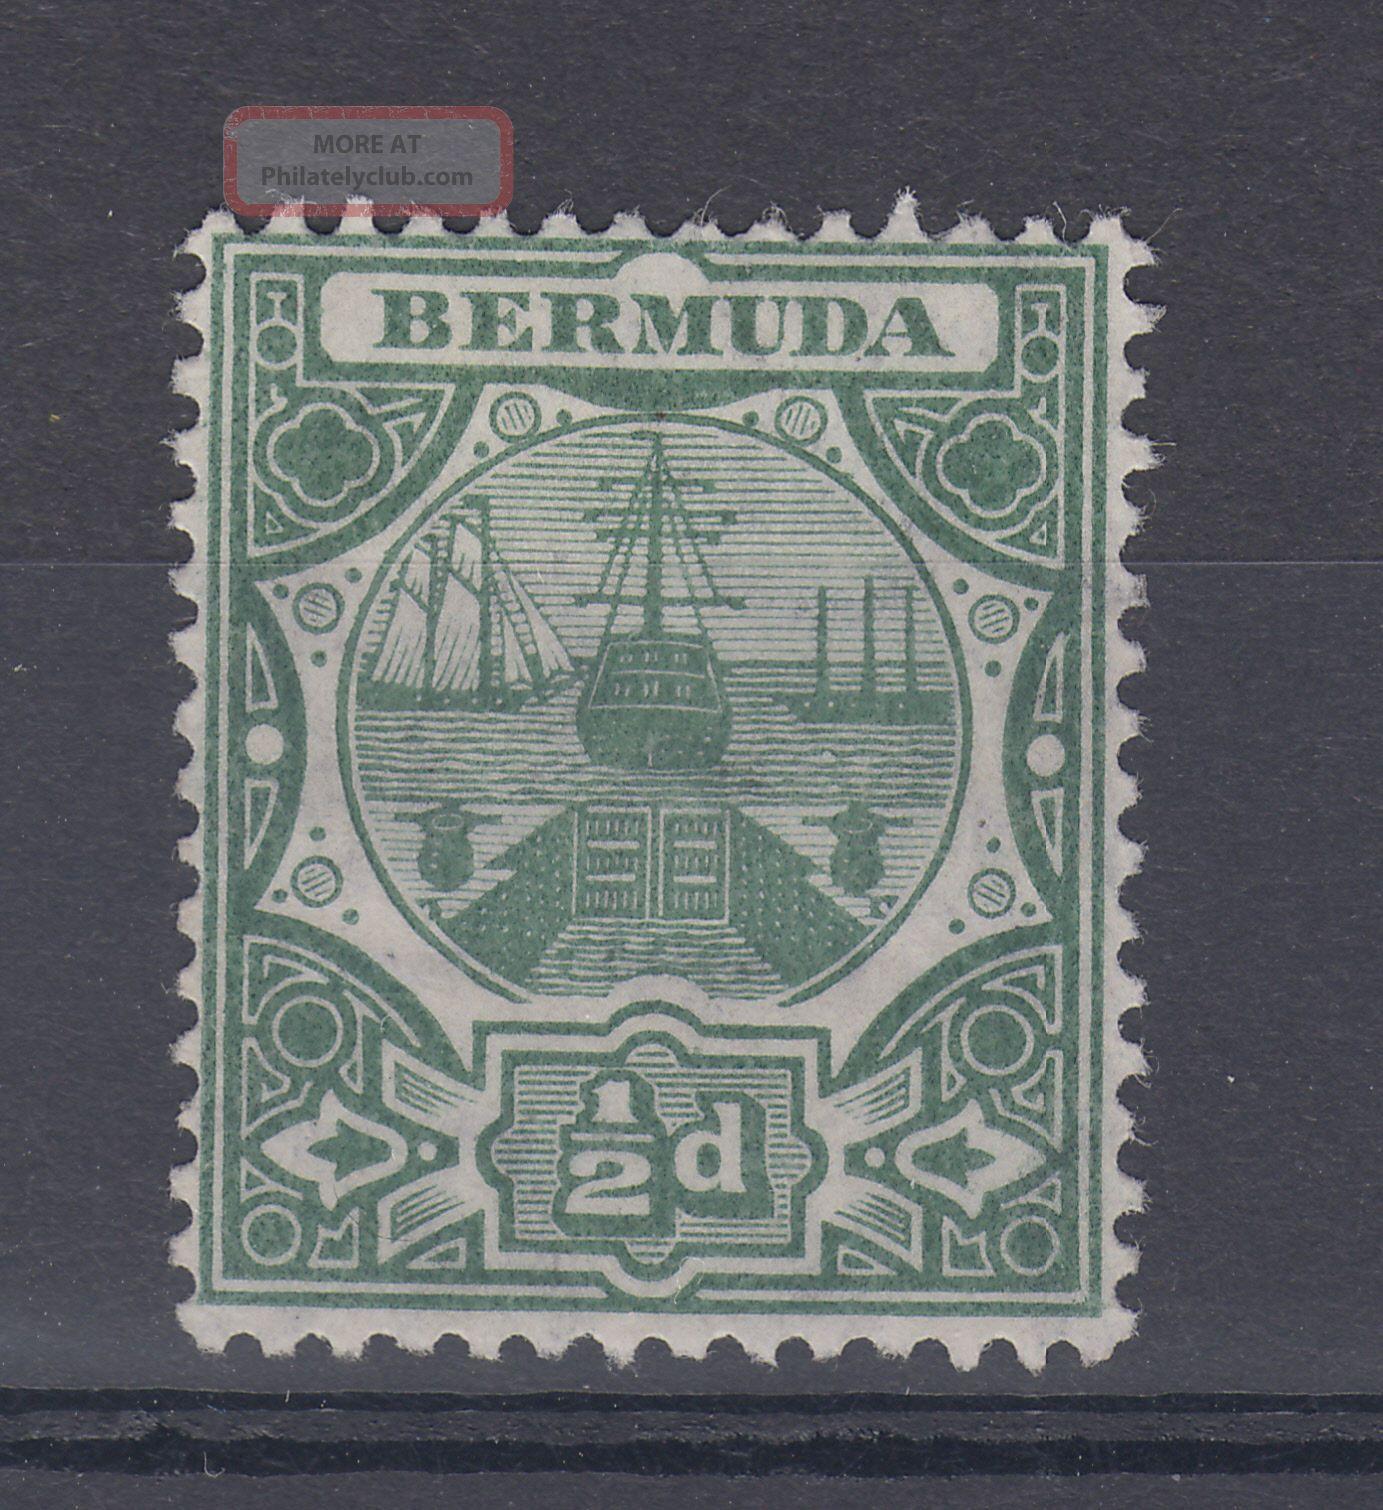 1909 Bermuda M/m Dry Dock 0.  5d Stamp (sg 36) British Colonies & Territories photo